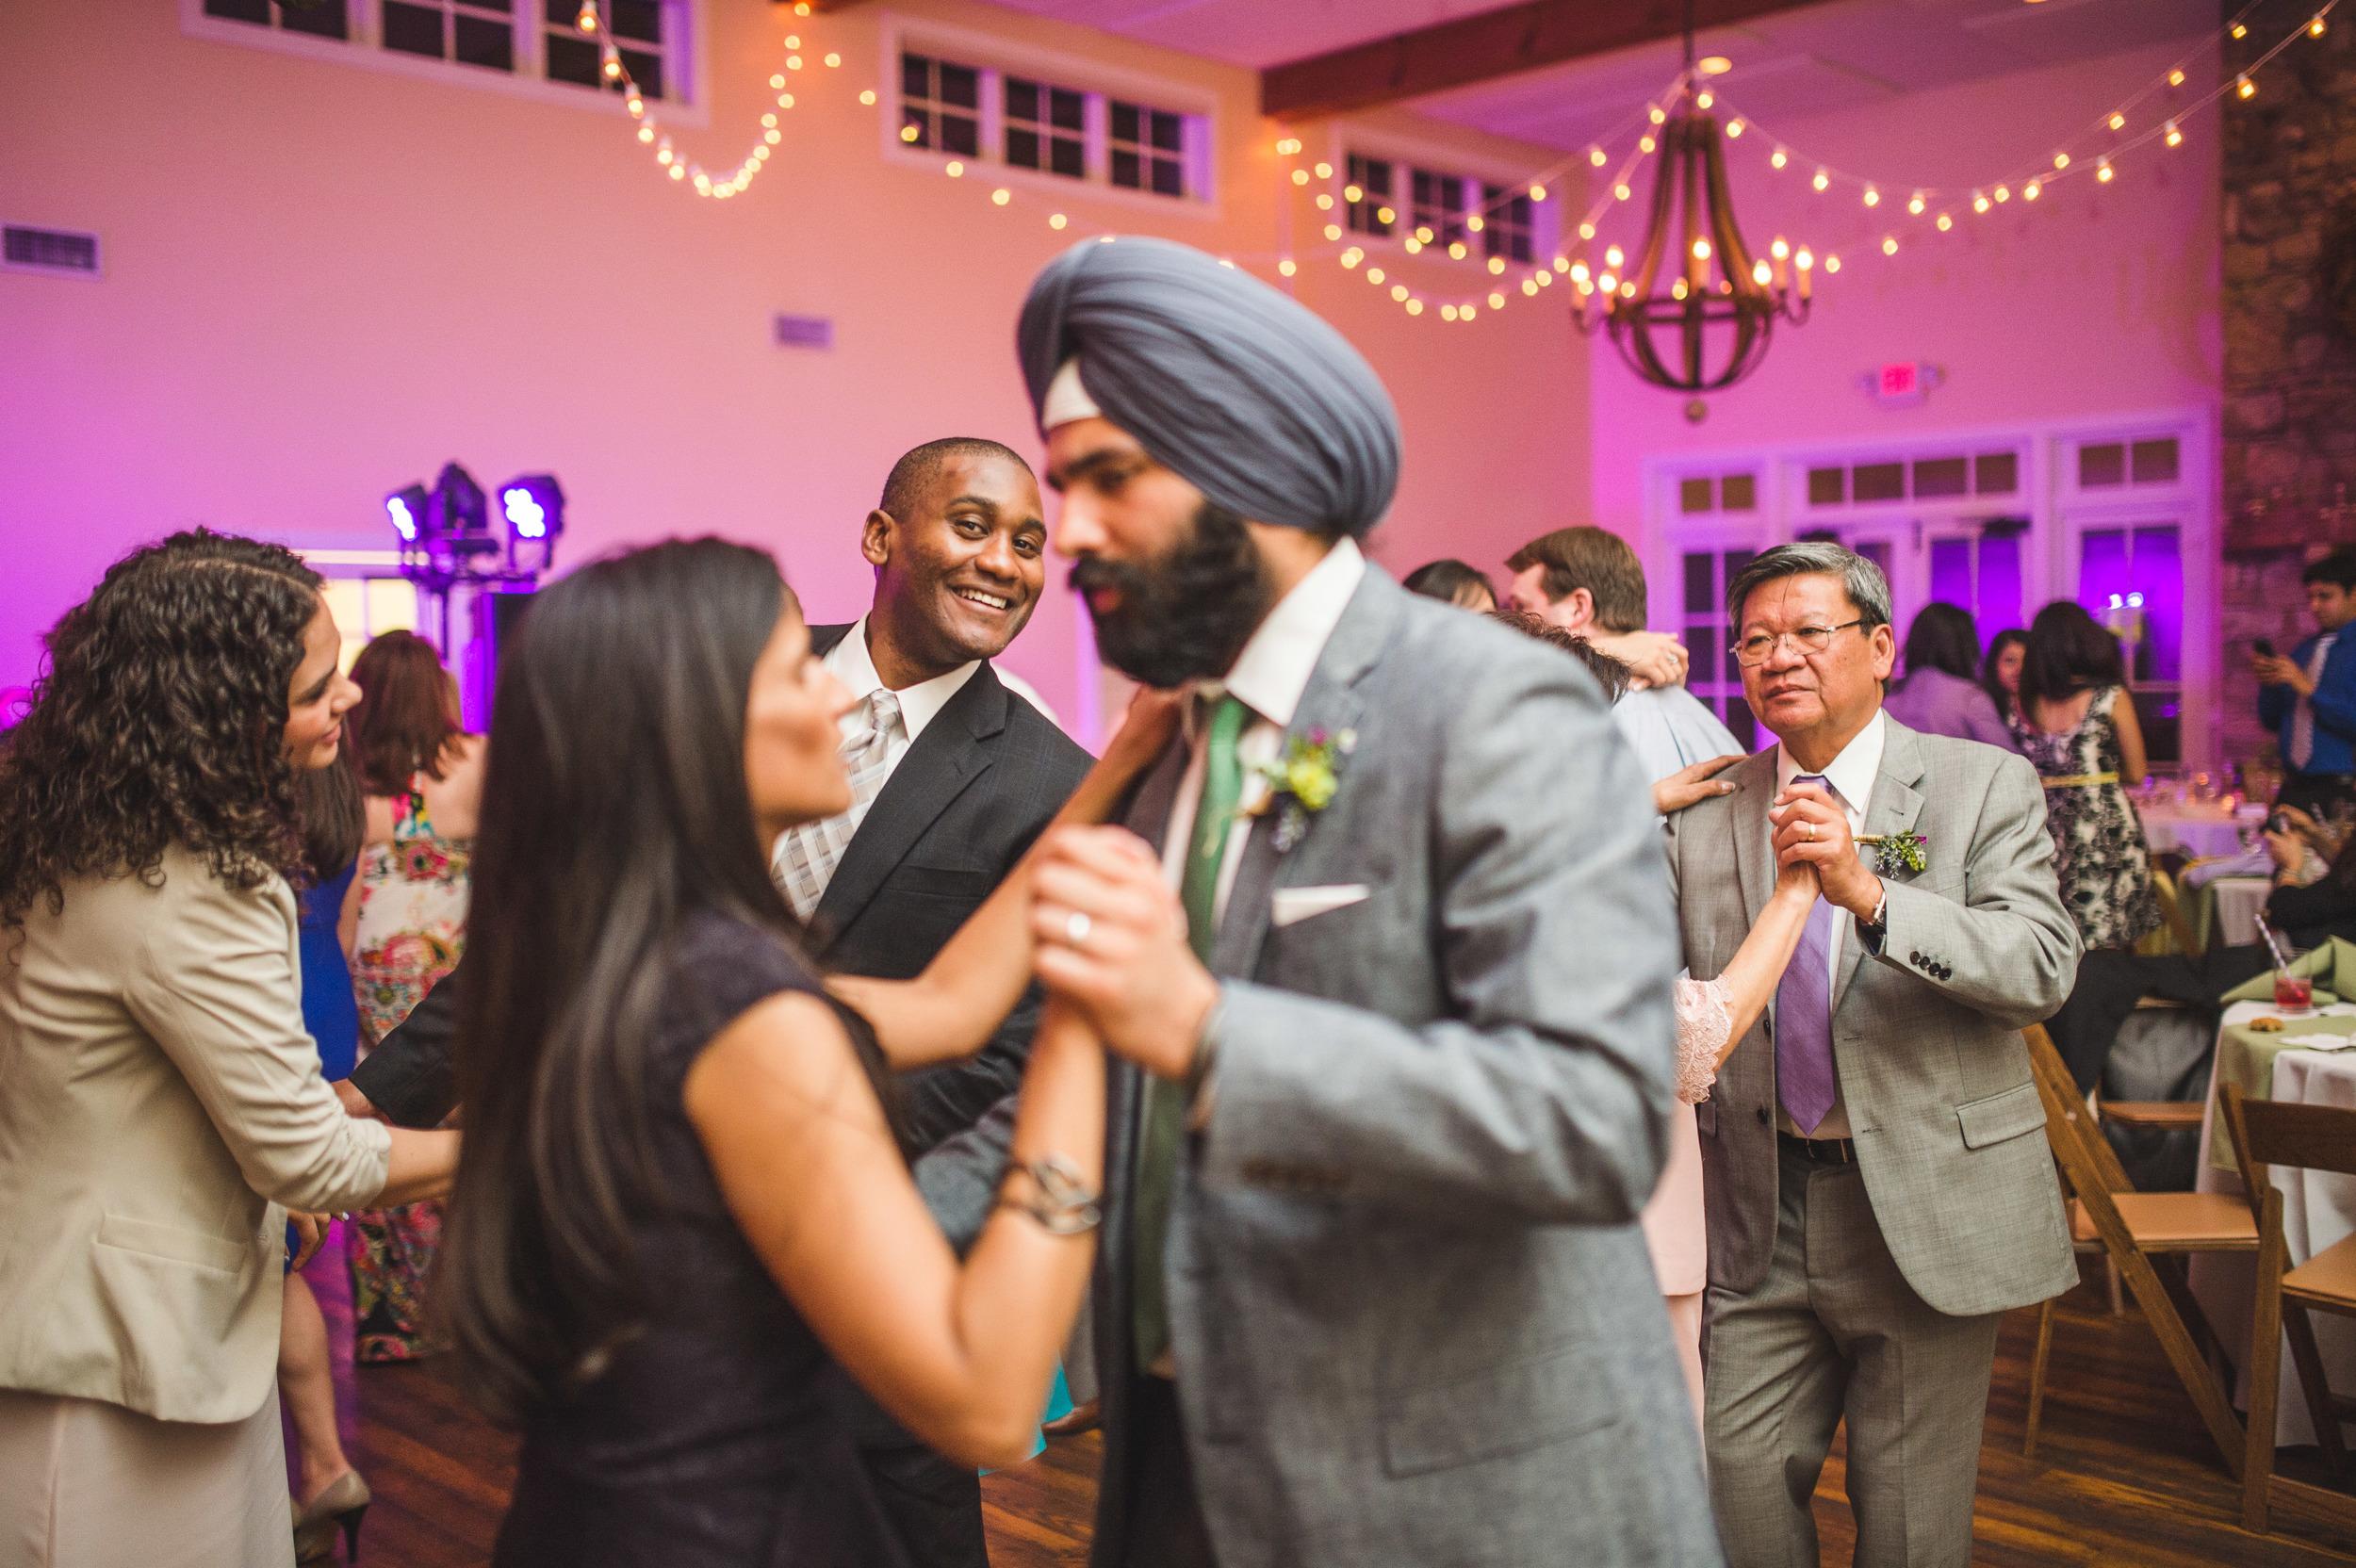 Photojournalistic wedding photography Baltimore MD By Mantas Kubilinskas-56.jpg